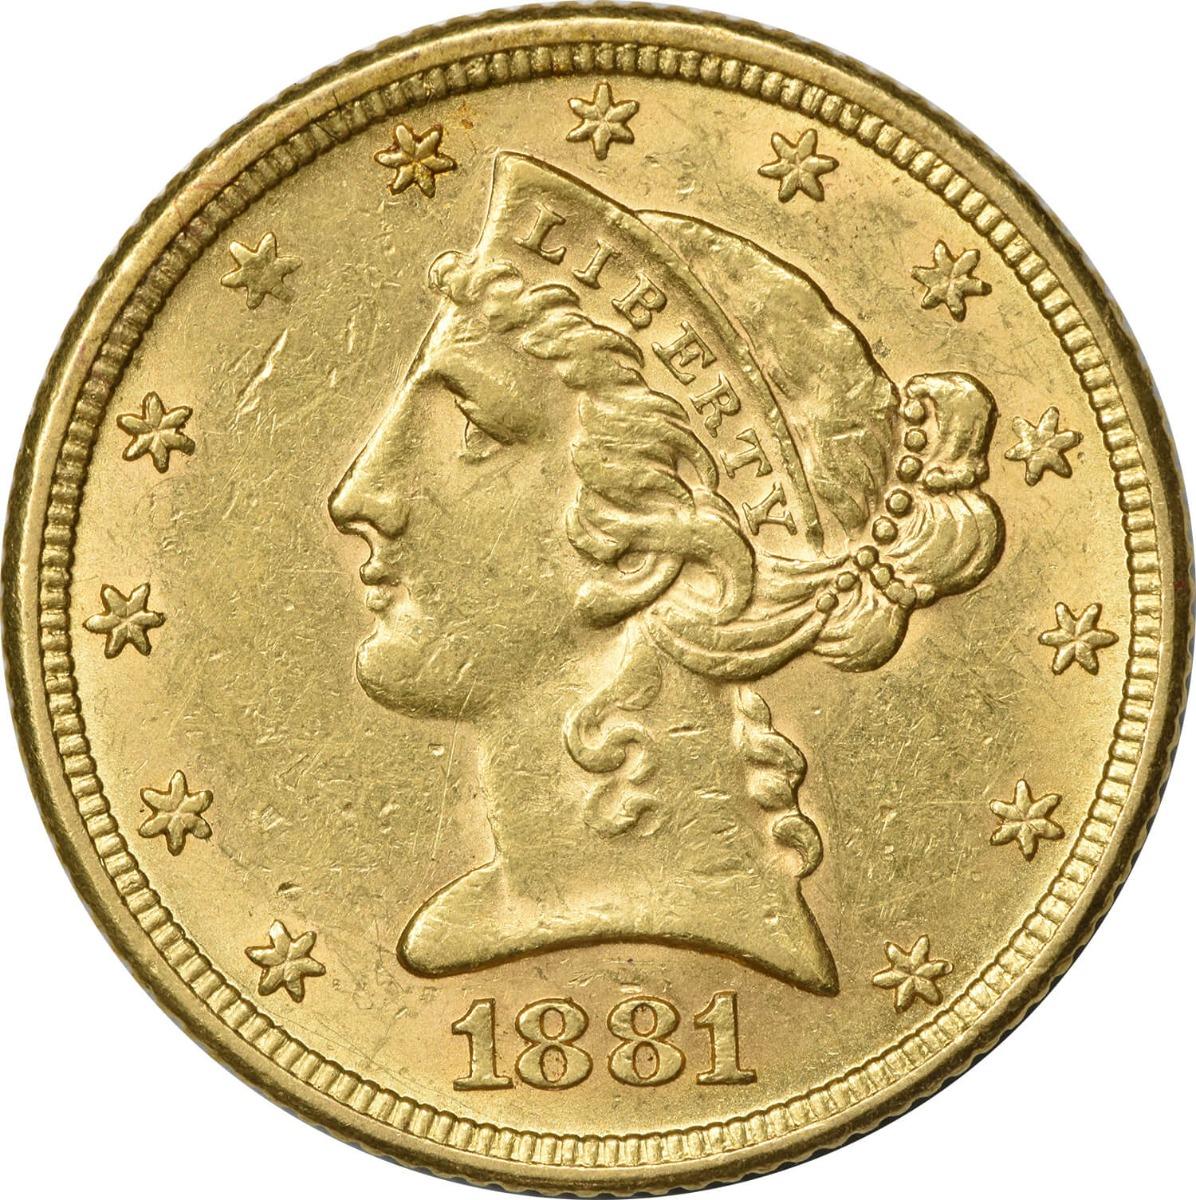 $5 Gold Liberty Half Eagle Random Date graded AU58